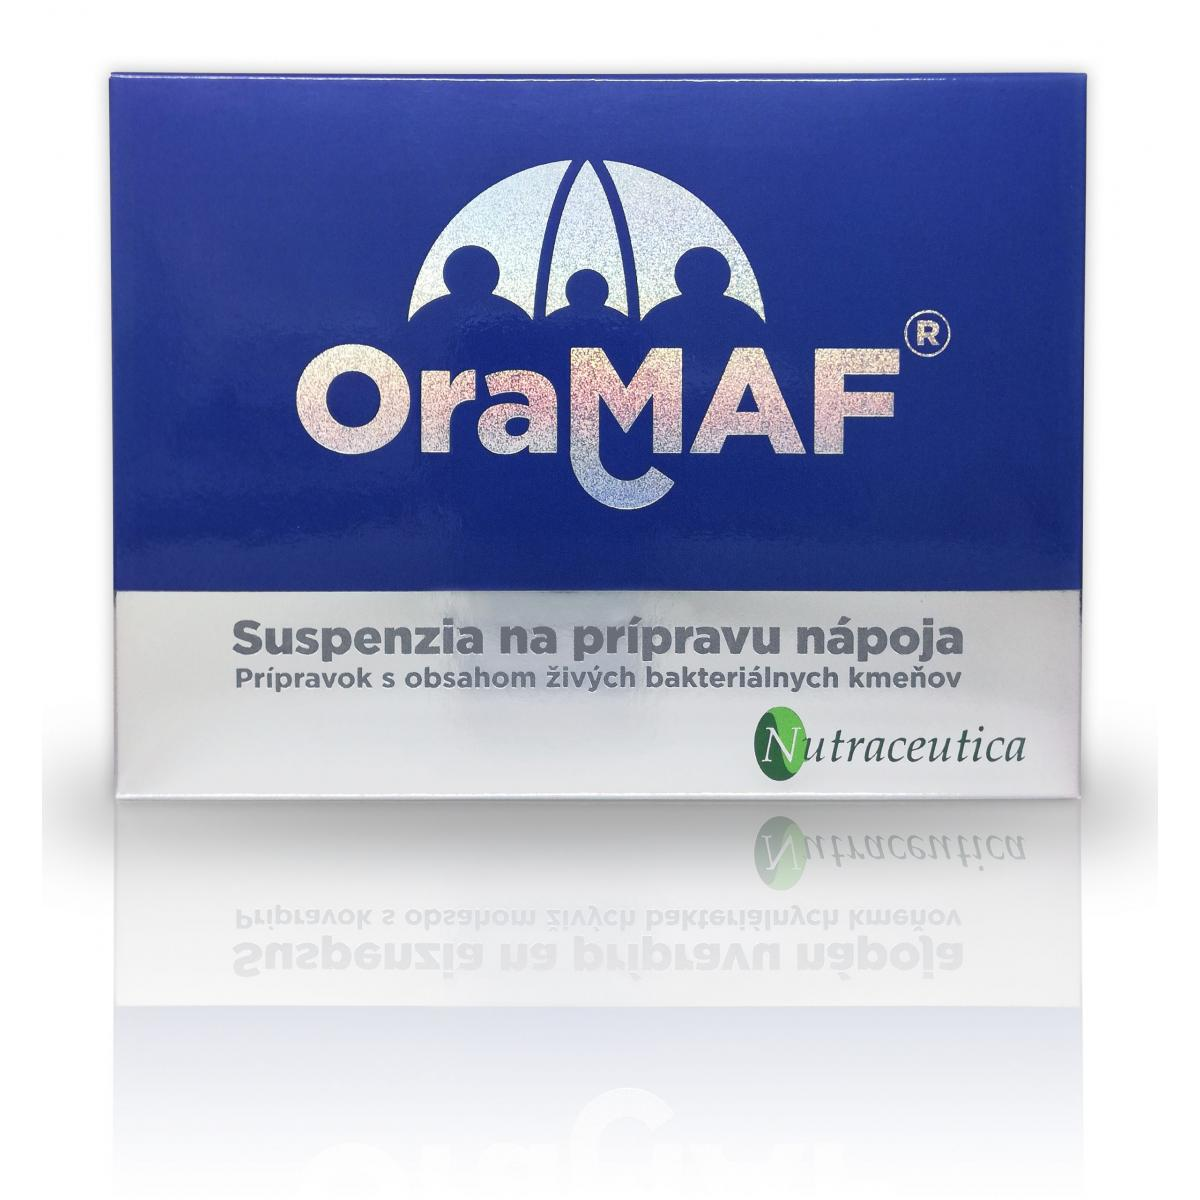 OraMAF suspenzia 4 x 100 g